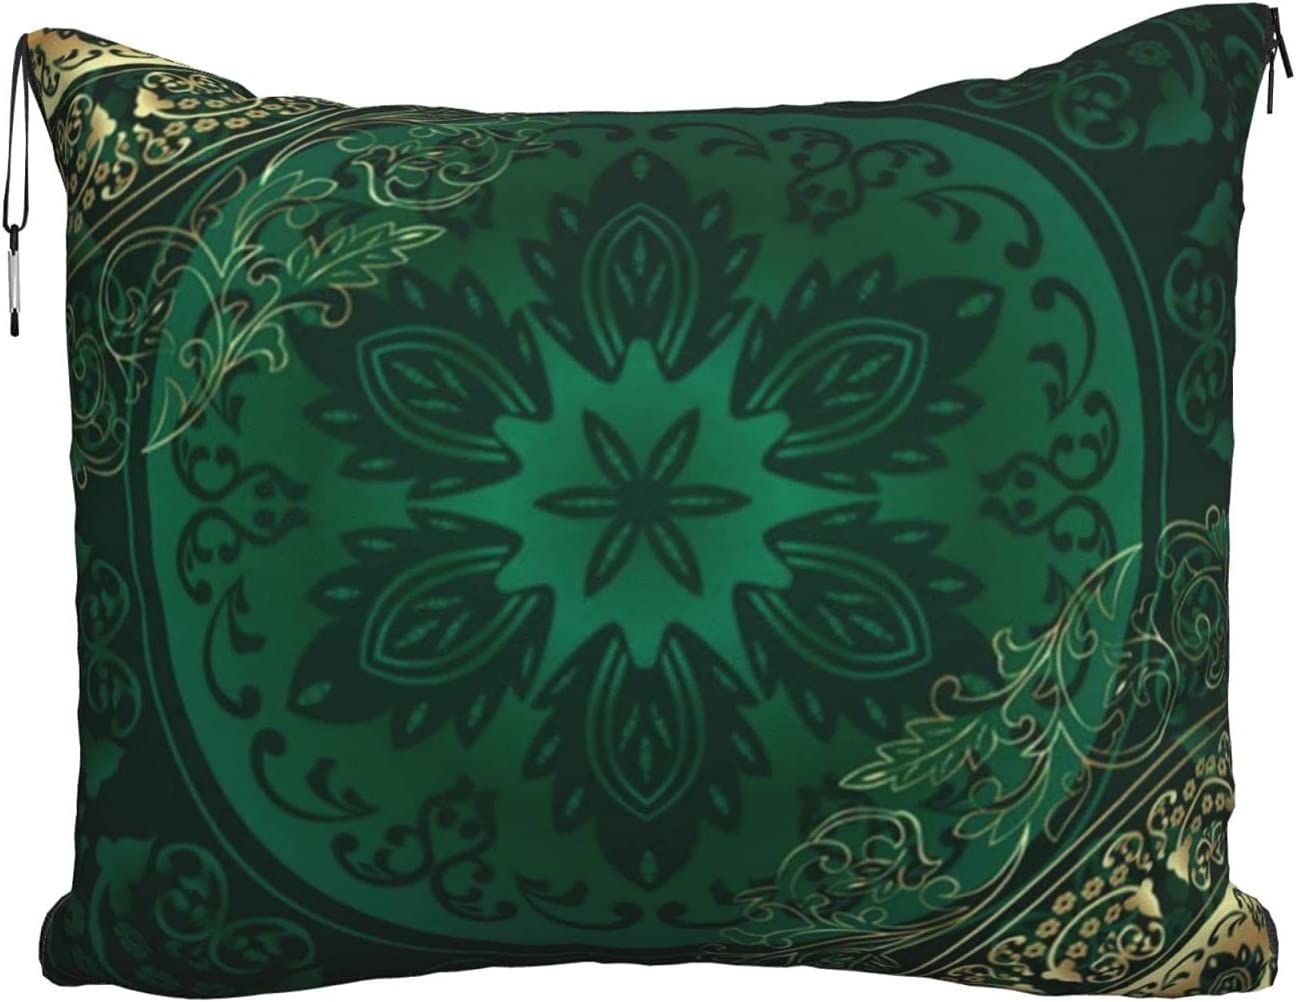 Mescchskgreen Vintage Floral Print Sacramento Mall Travel Max 81% OFF Pillow T Combo Blanket